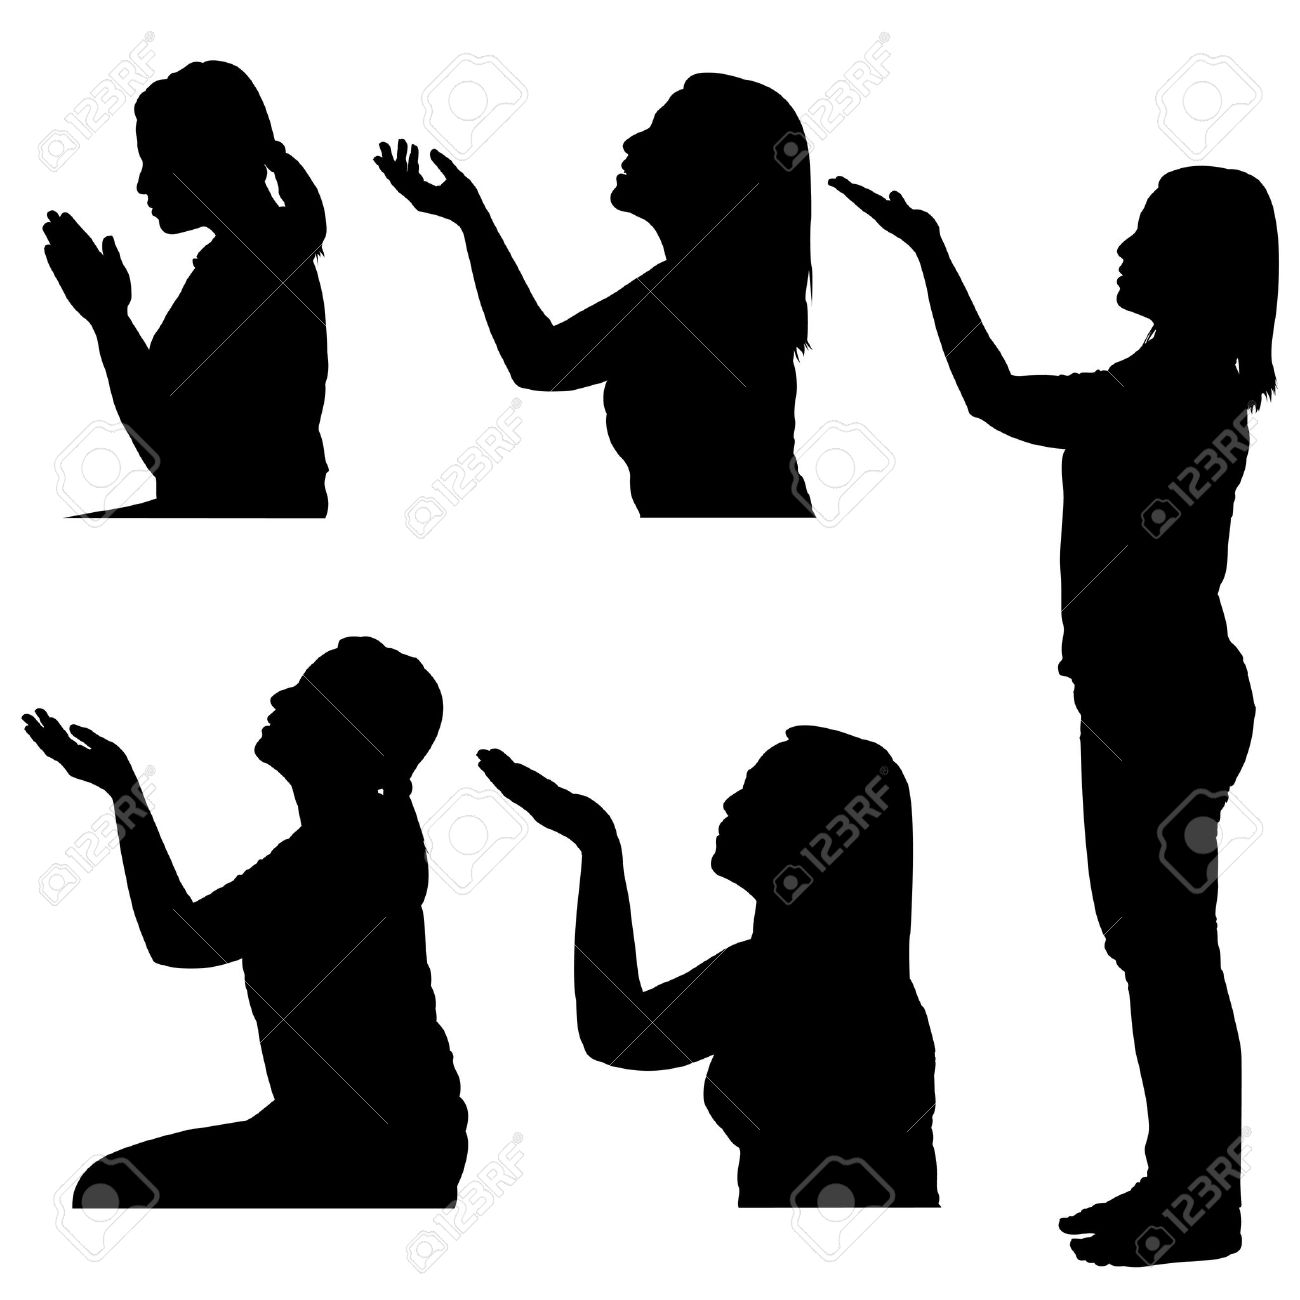 Woman Praying Clipart Silhouettes of Woman Praying